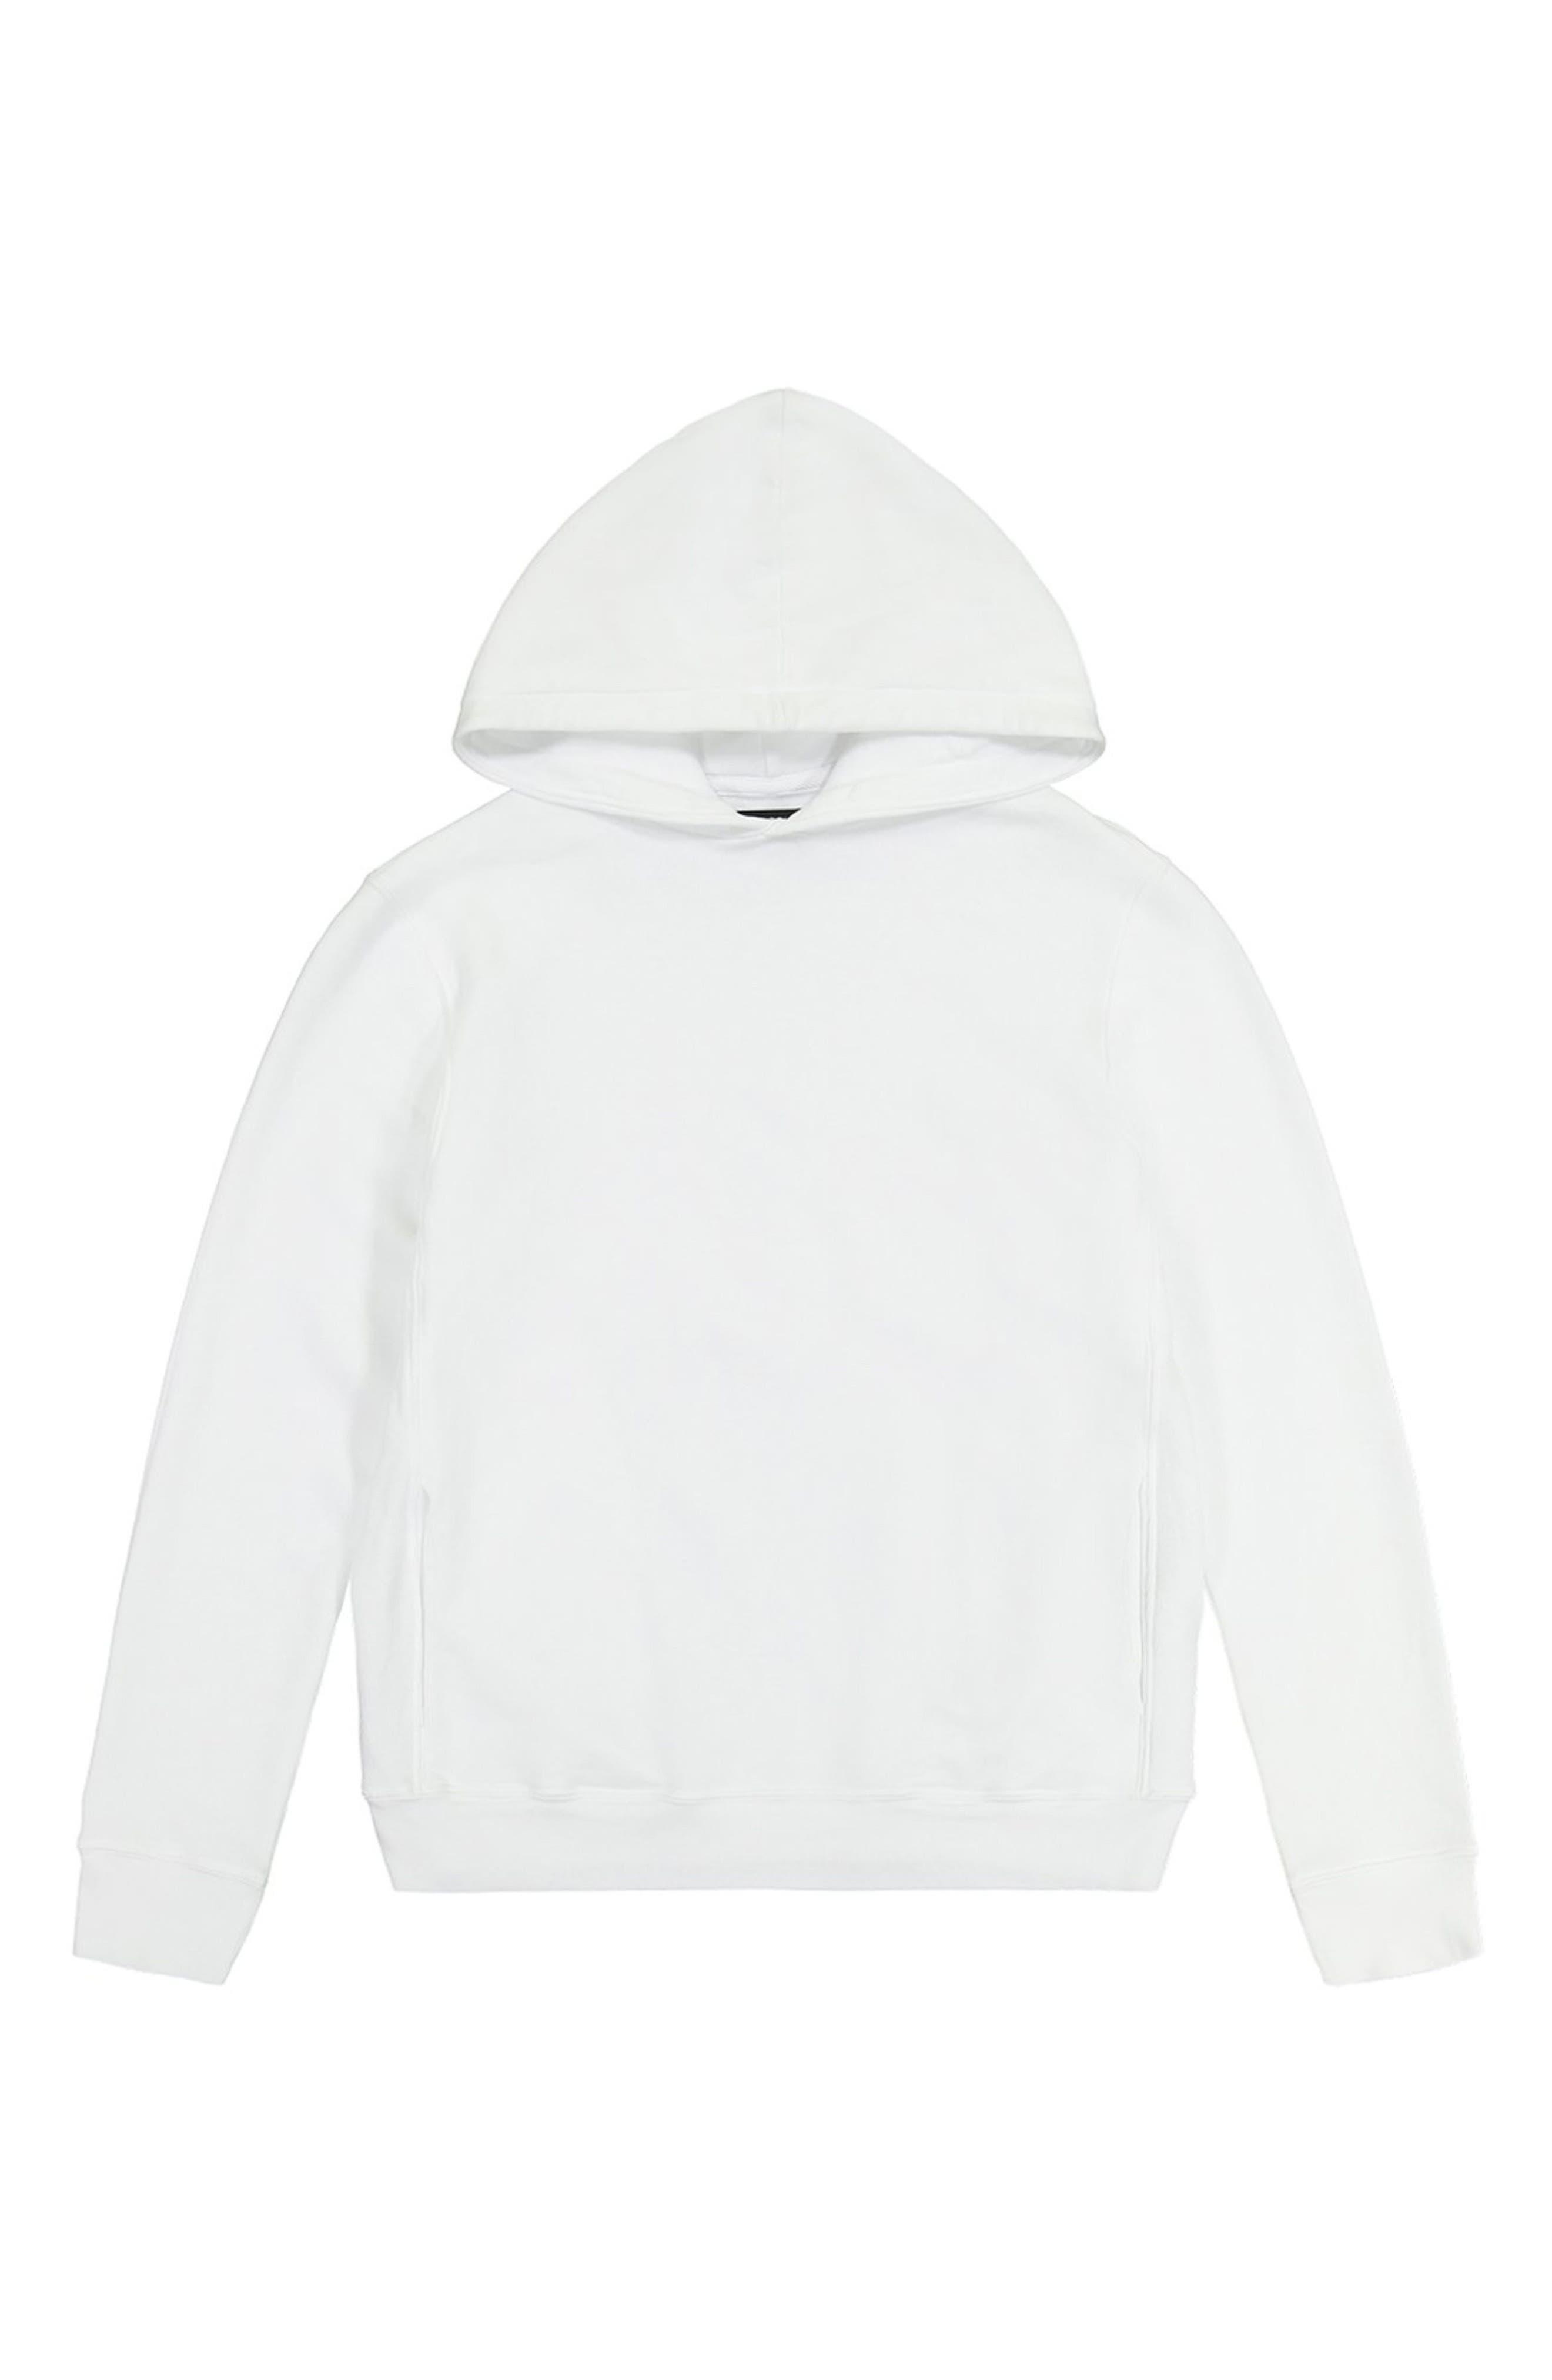 Terry Cloth Hoodie